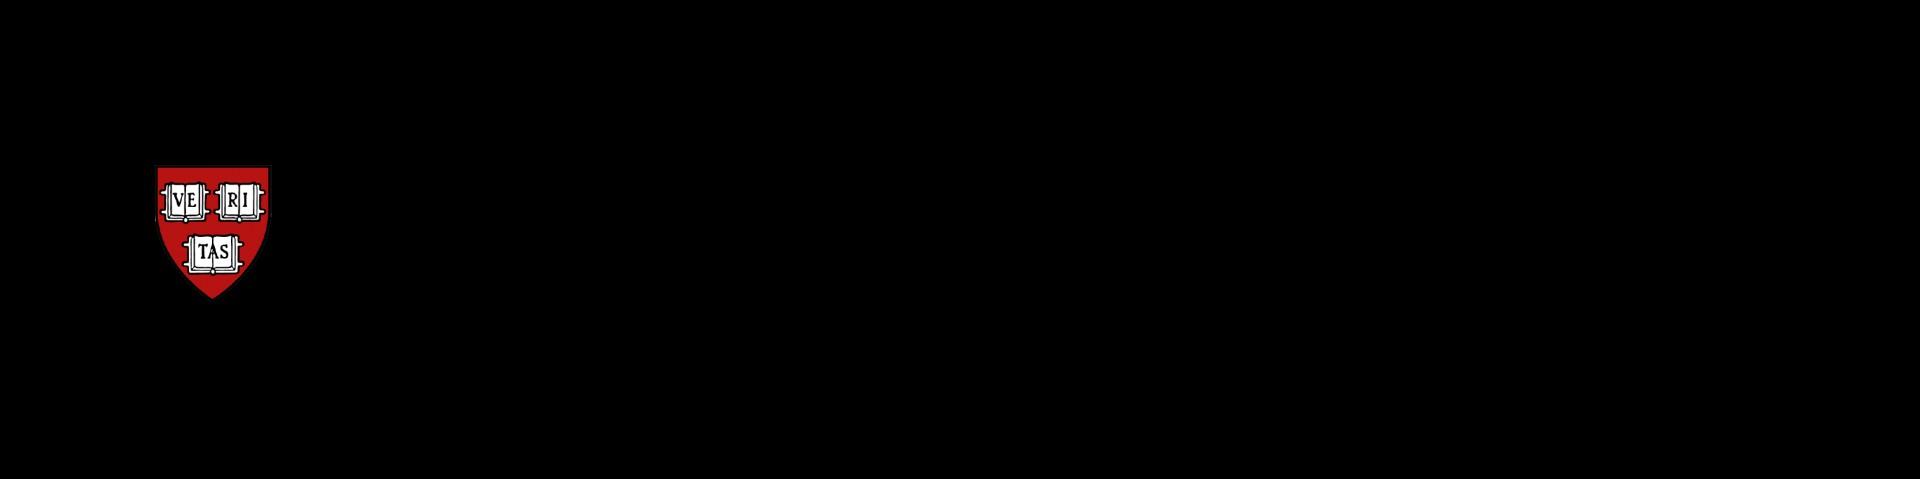 023 Bok Logo Harvard Left Shield Black Original 1 Why Do You Want To Teacher Essay Impressive Be A Pdf Would Become 1920